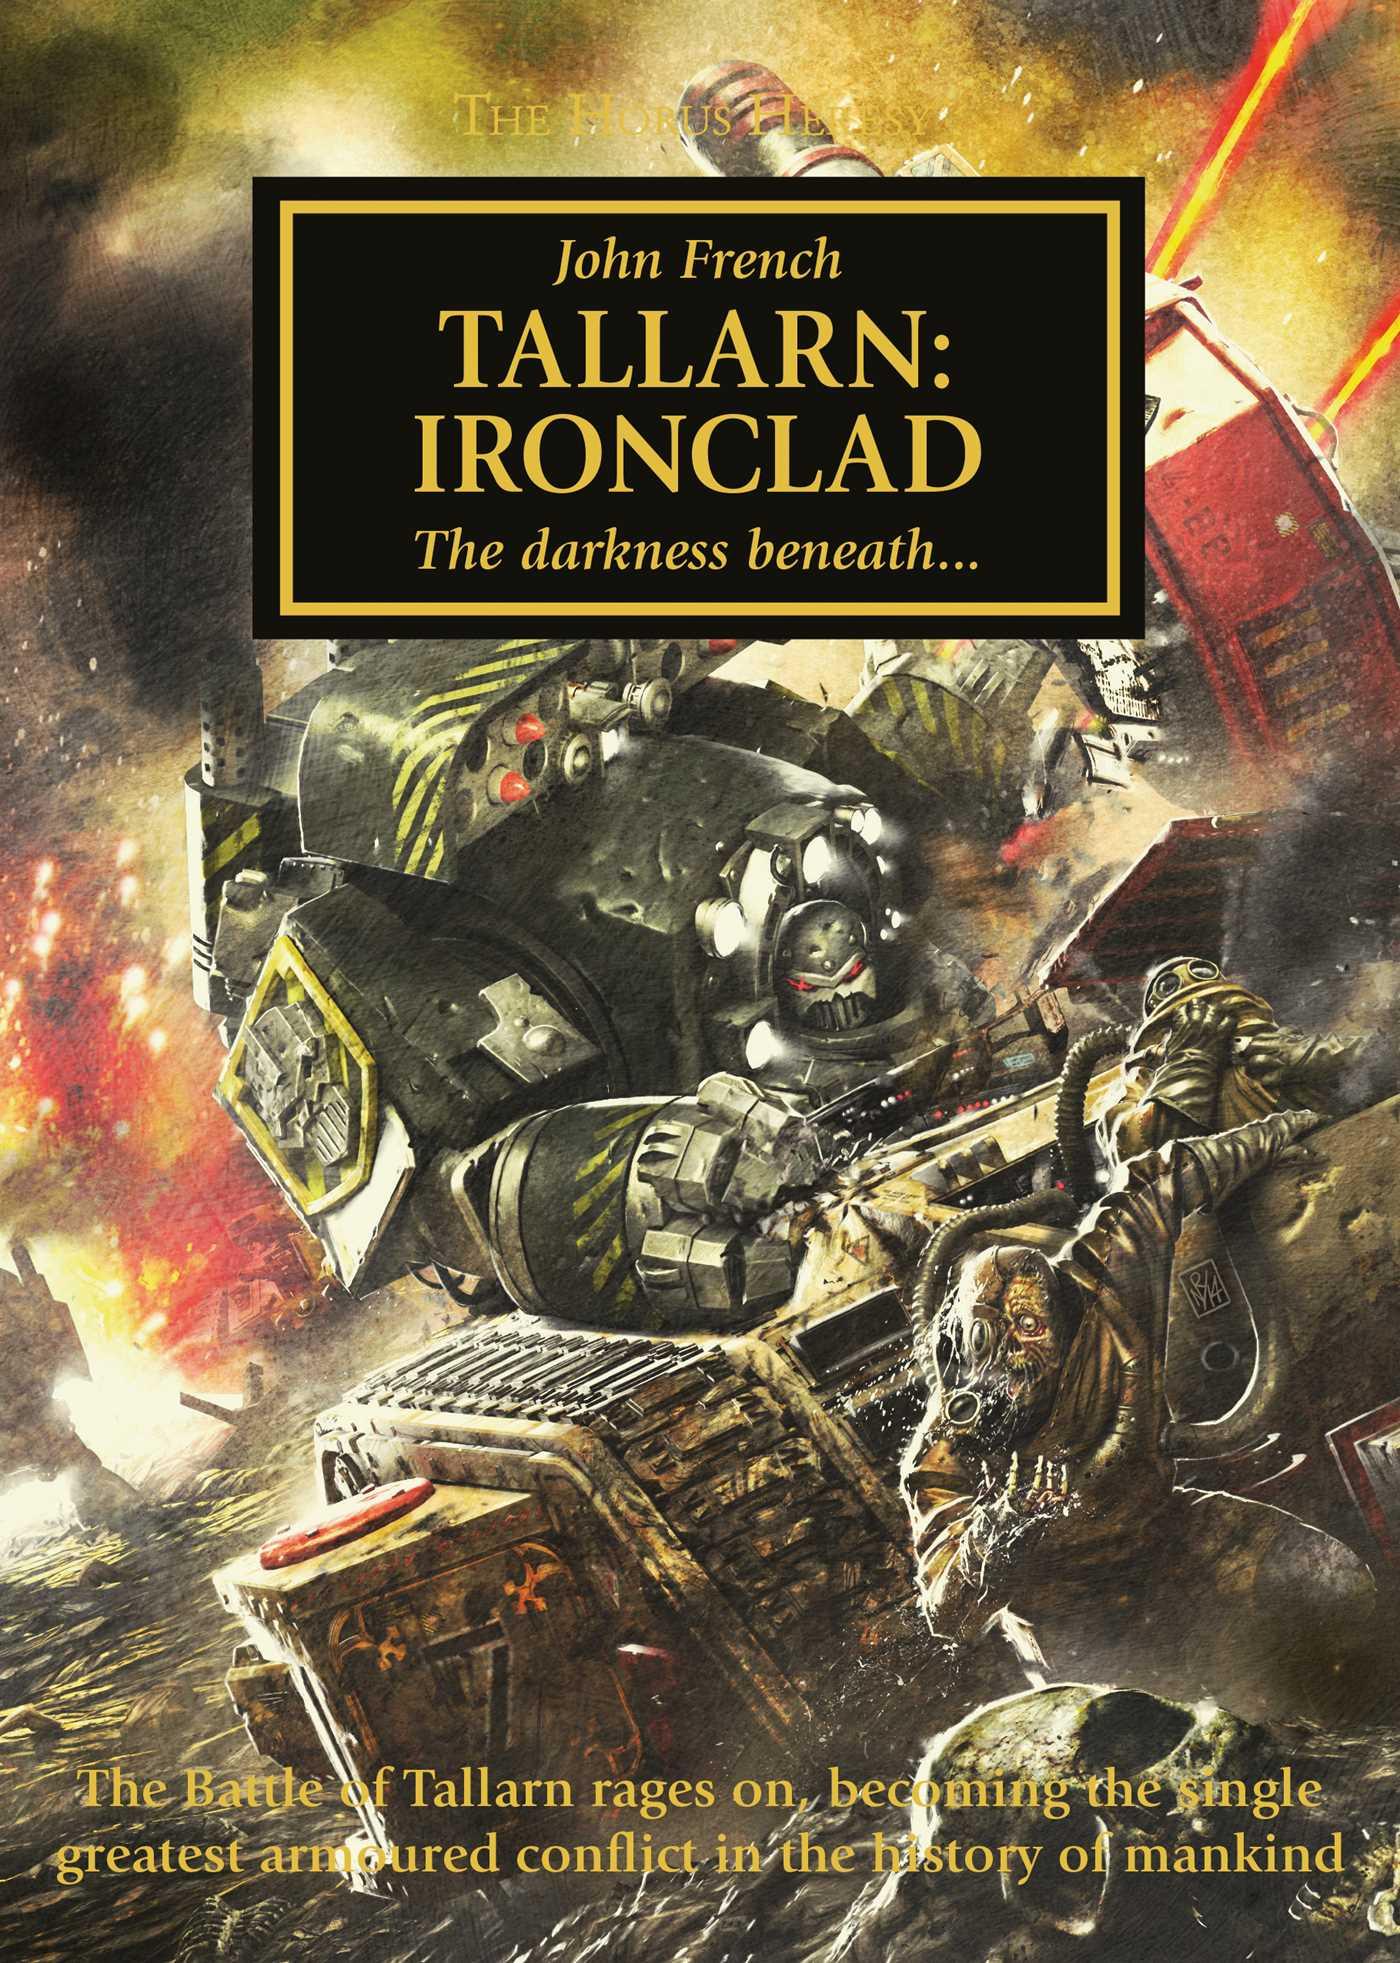 Tallarn ironclad 9781784961350 hr